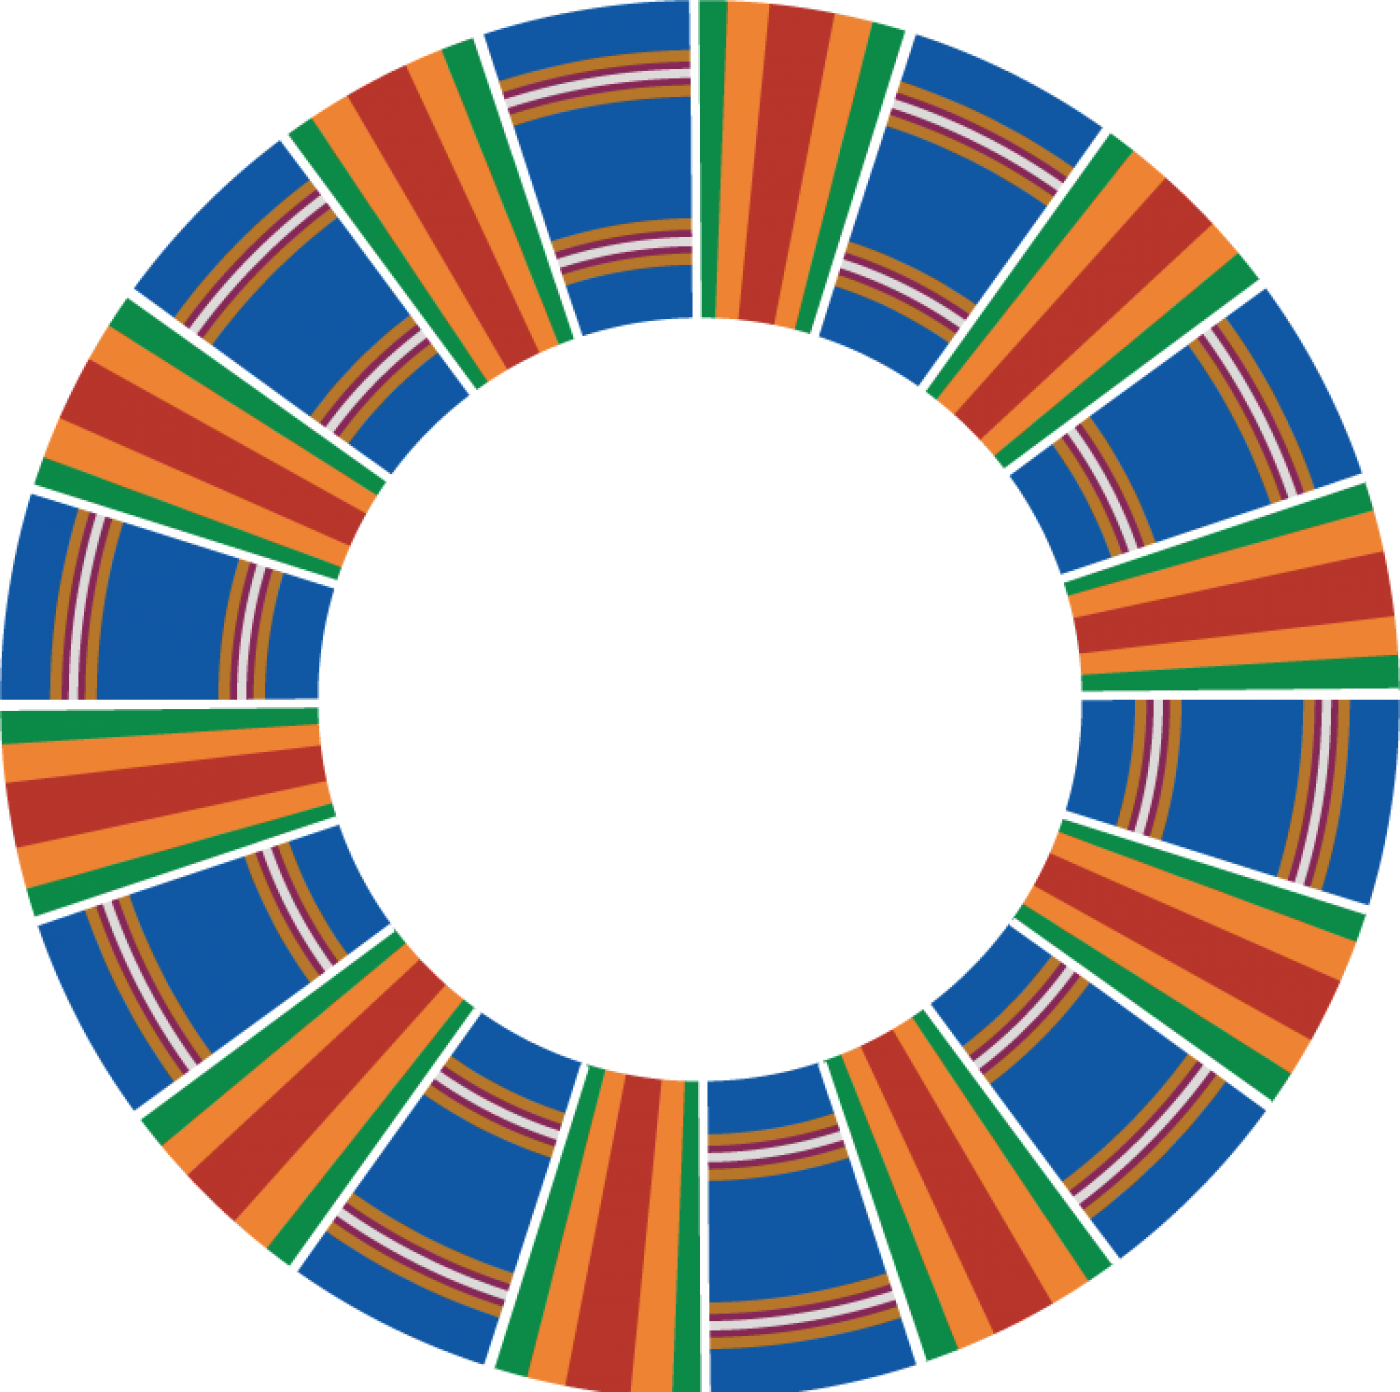 QEW African Diaspora Earthcare Coalition